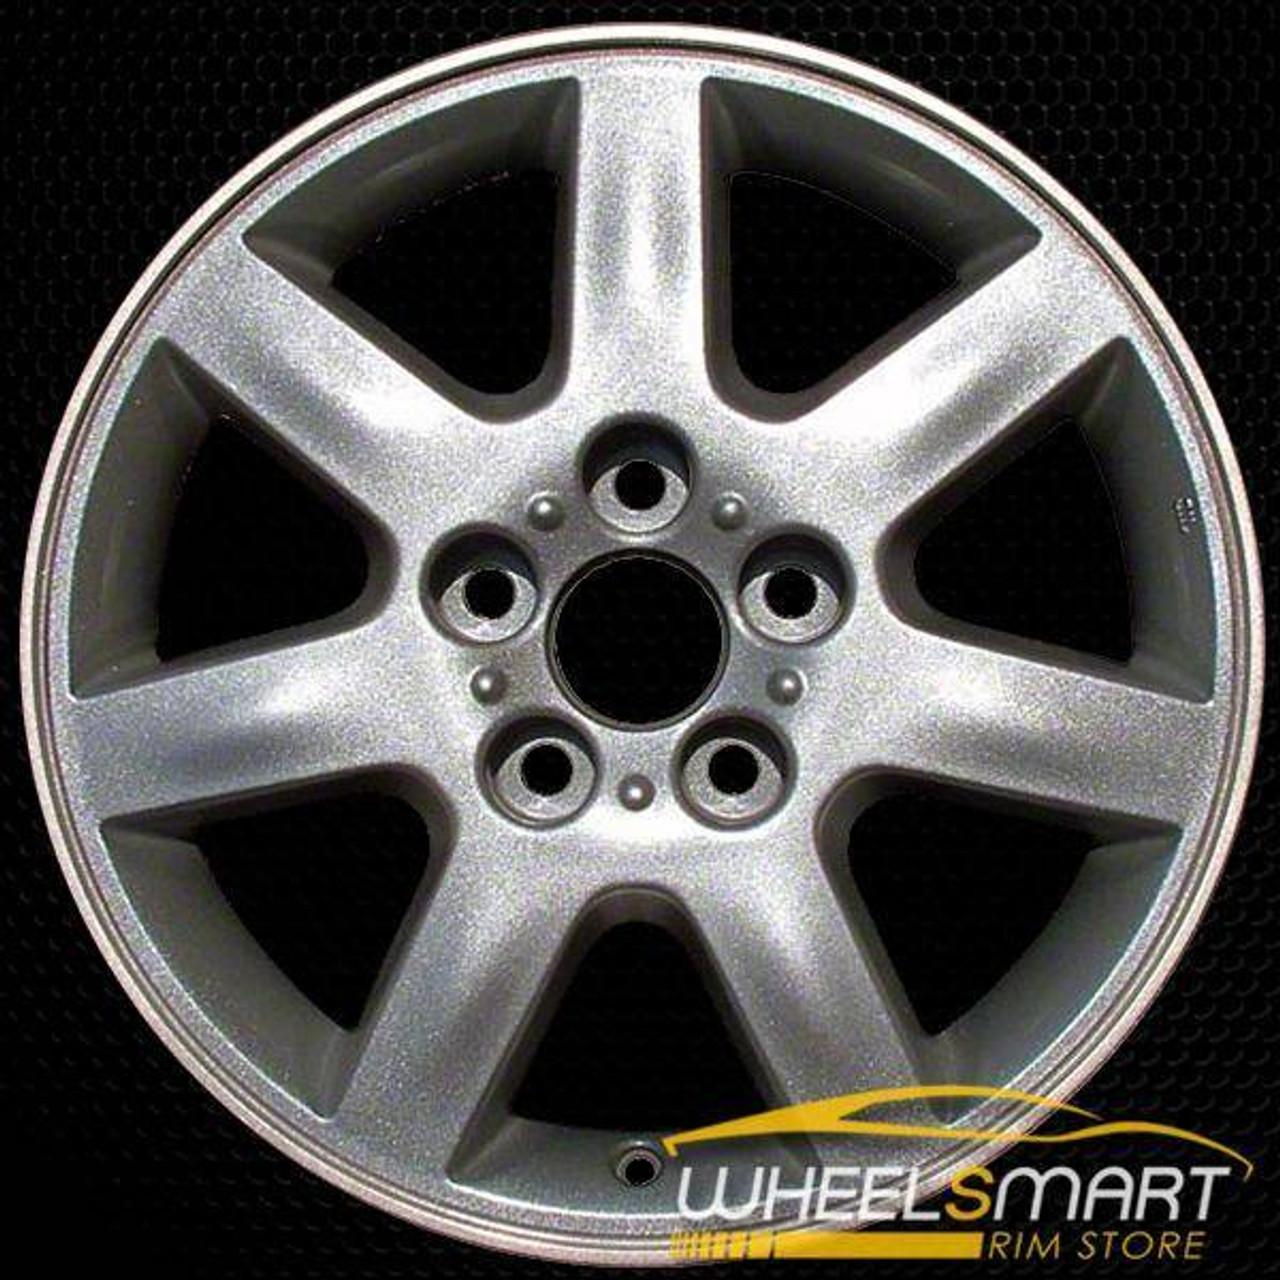 2000 2004 toyota avalon oem wheels 16 silver stock rims 69383 16 toyota avalon oem wheel 2000 2004 silver alloy stock rim 69383